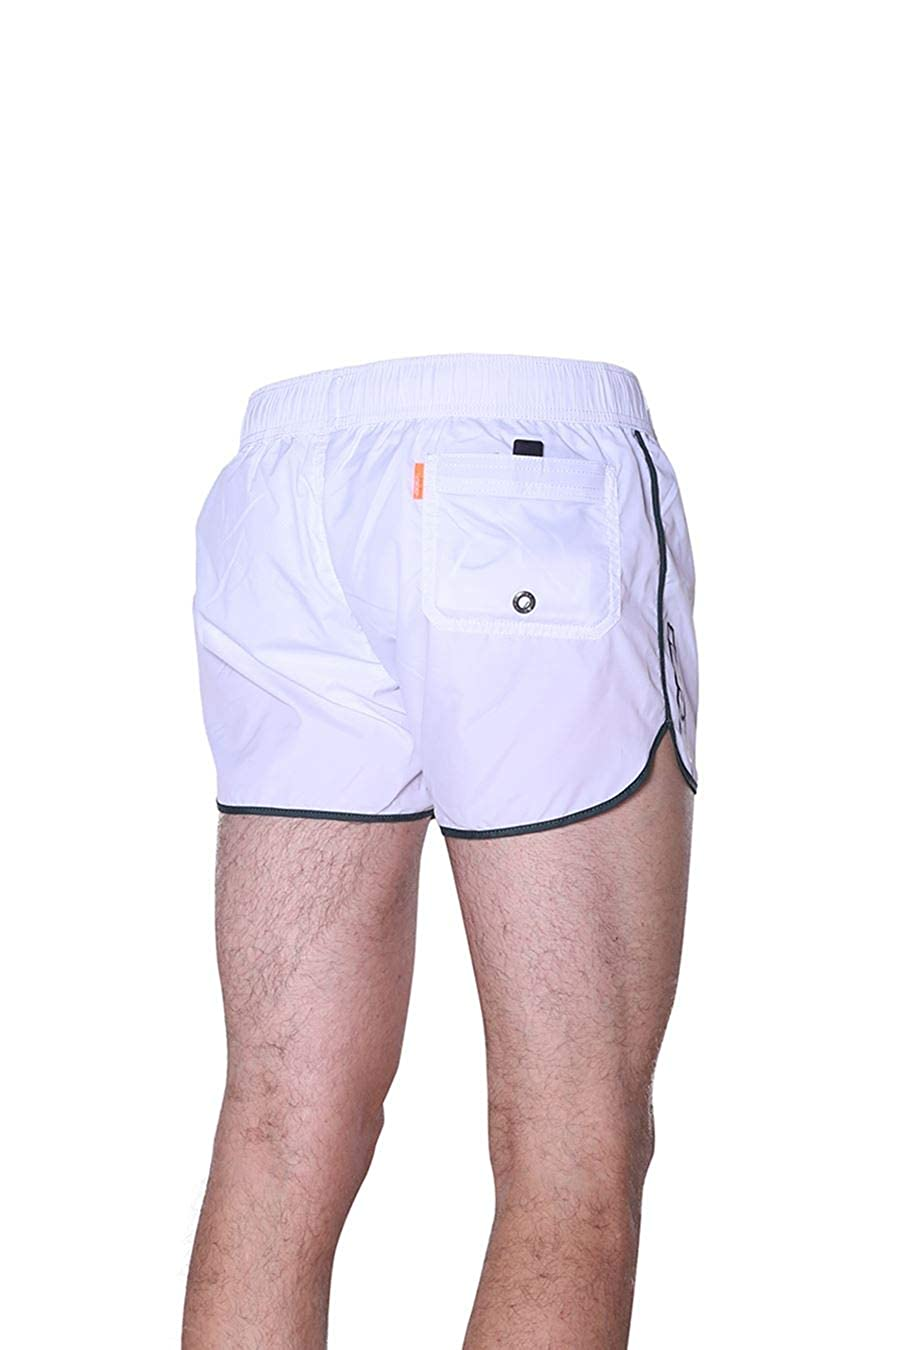 46 Rrd Costume Uomo Short Ponente Super 19300 PESD 09